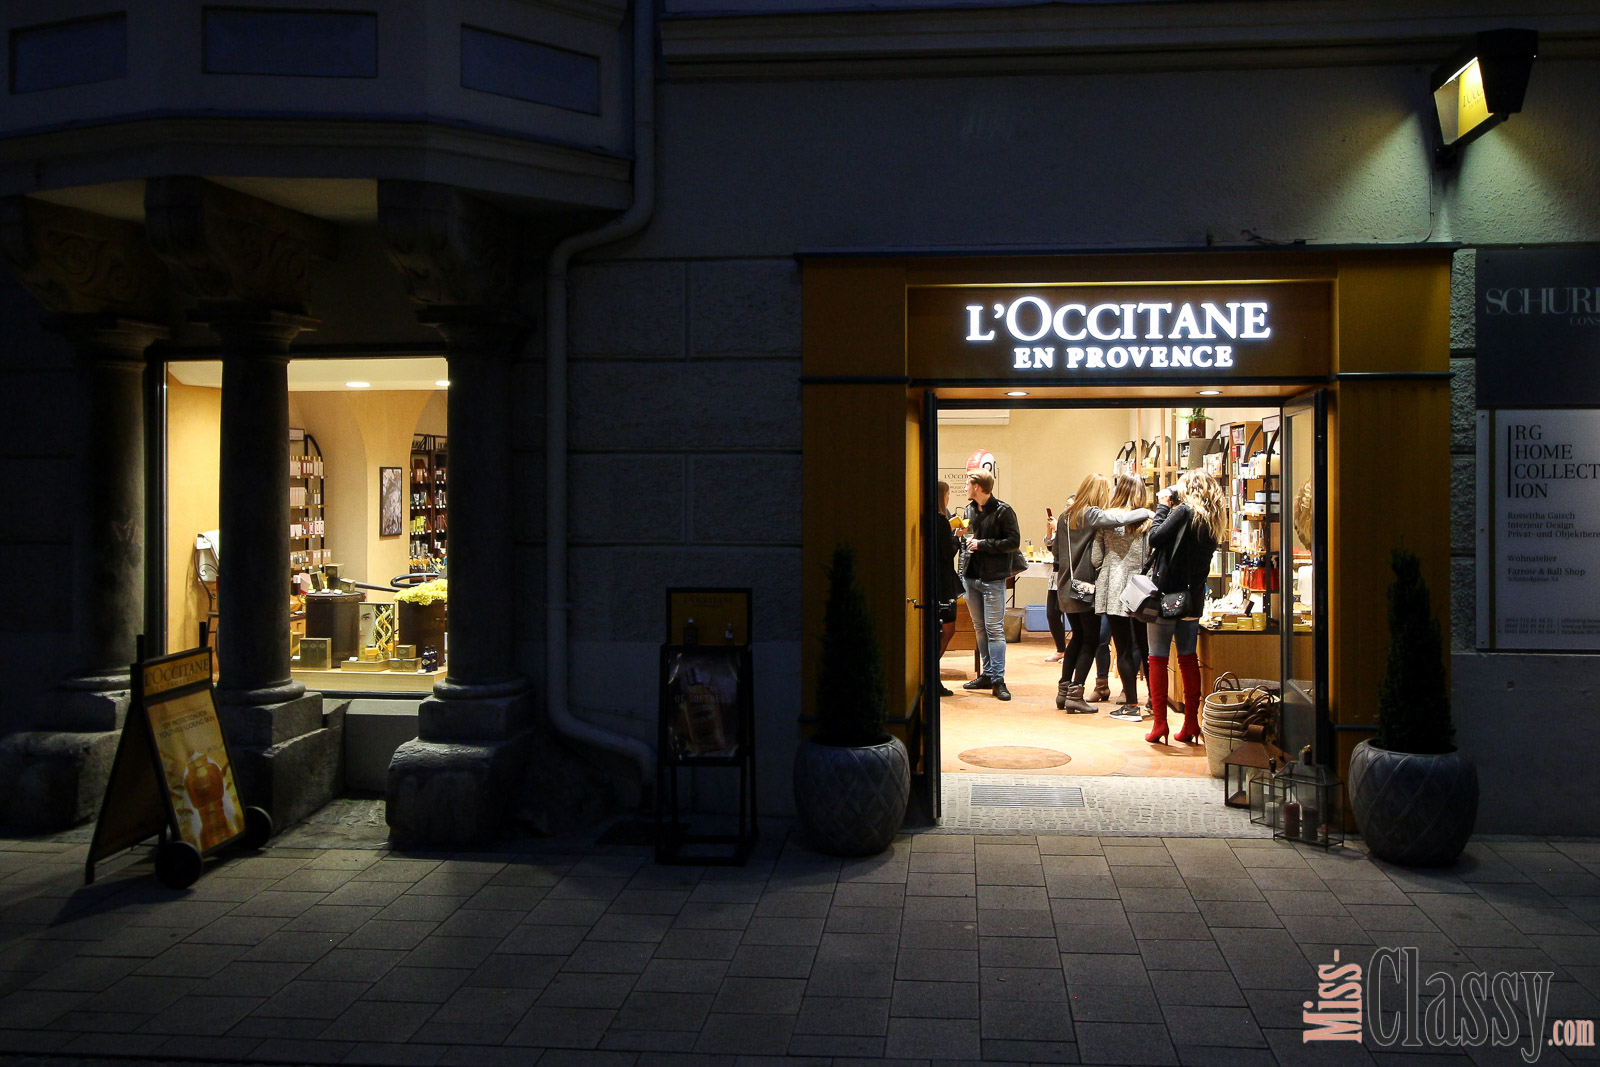 LIFESTYLE: L'Occitane en Provence feiert den 20. Geburtstag in Graz, Miss Classy, Lifestyle Blog, Beauty Blog, Graz, Steiermark, Österreich, classy, beclassy, Provence, Kosmetik, Parfum, Gesichtspflege, Store, Shop, Lavendel, Bloggerevent, L'Occitane en Provence Shop Schmiedgasse 21